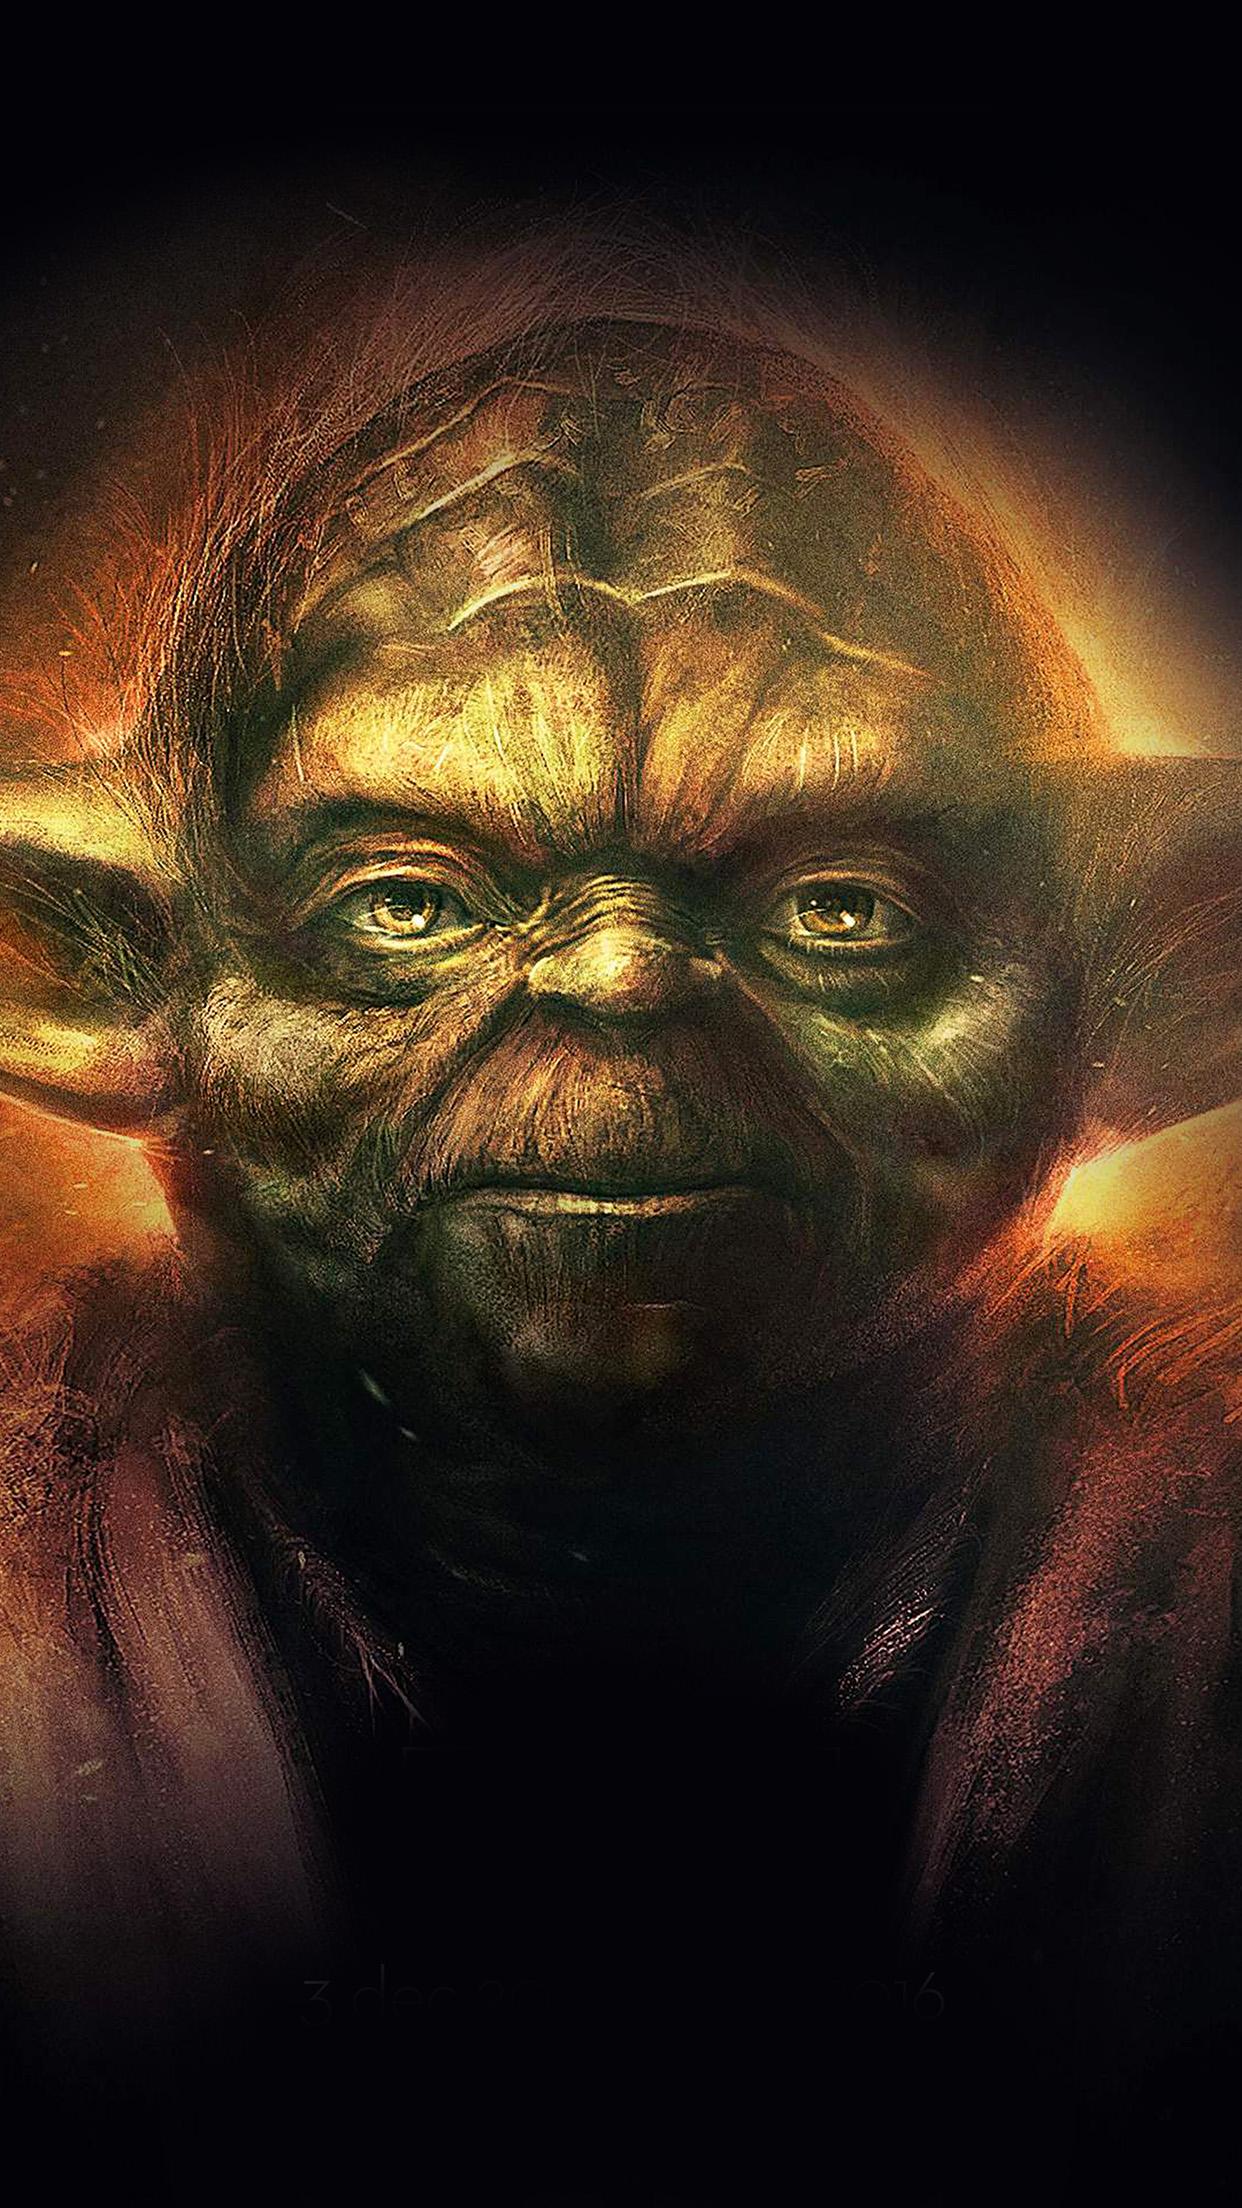 Yoda Starwars Art Dark Illlust Film Poster Android Wallpaper Android Hd Wallpapers